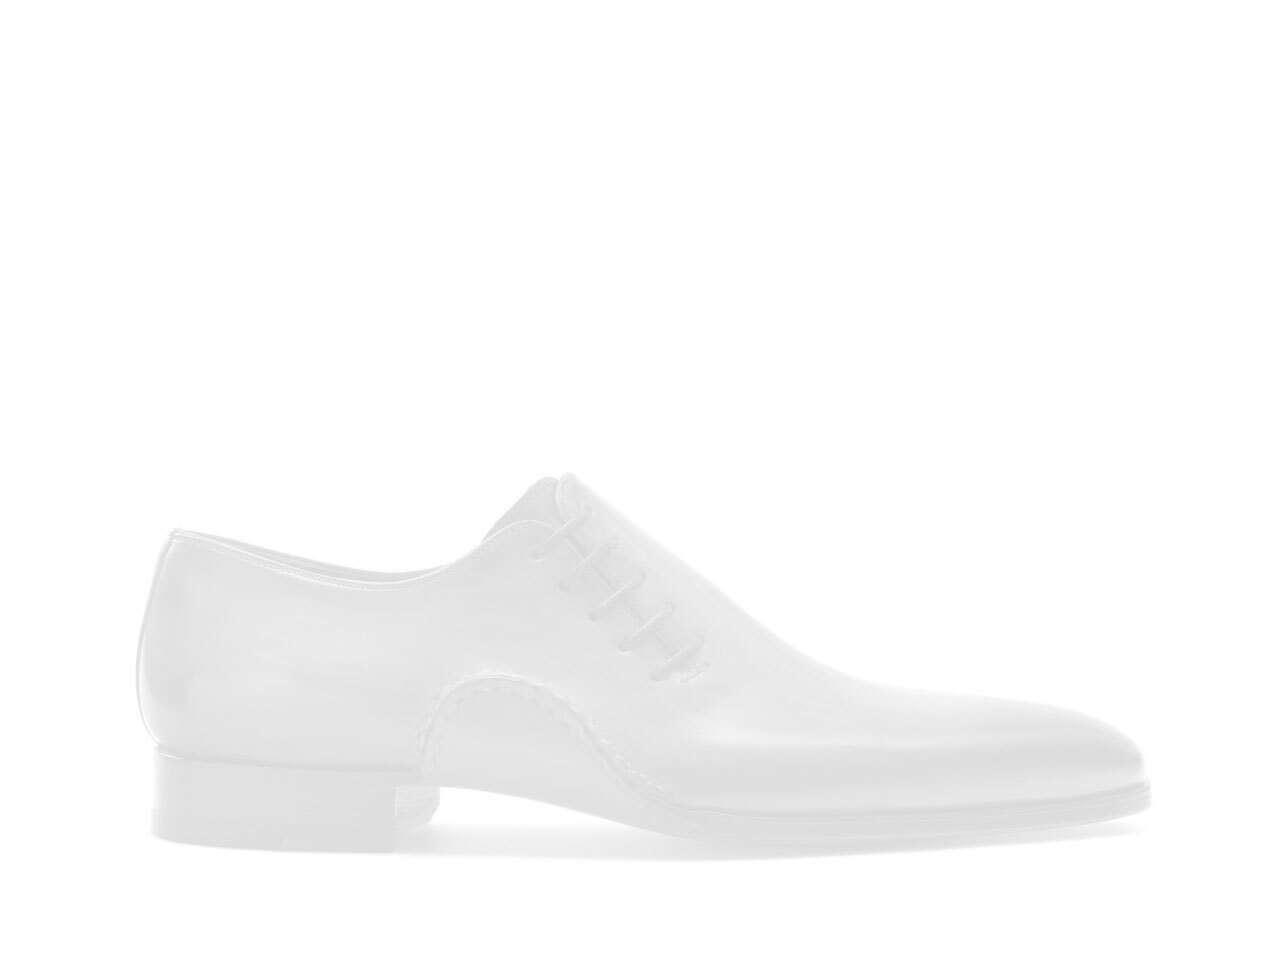 Silvio grey double monk strap shoes for men -  Magnanni